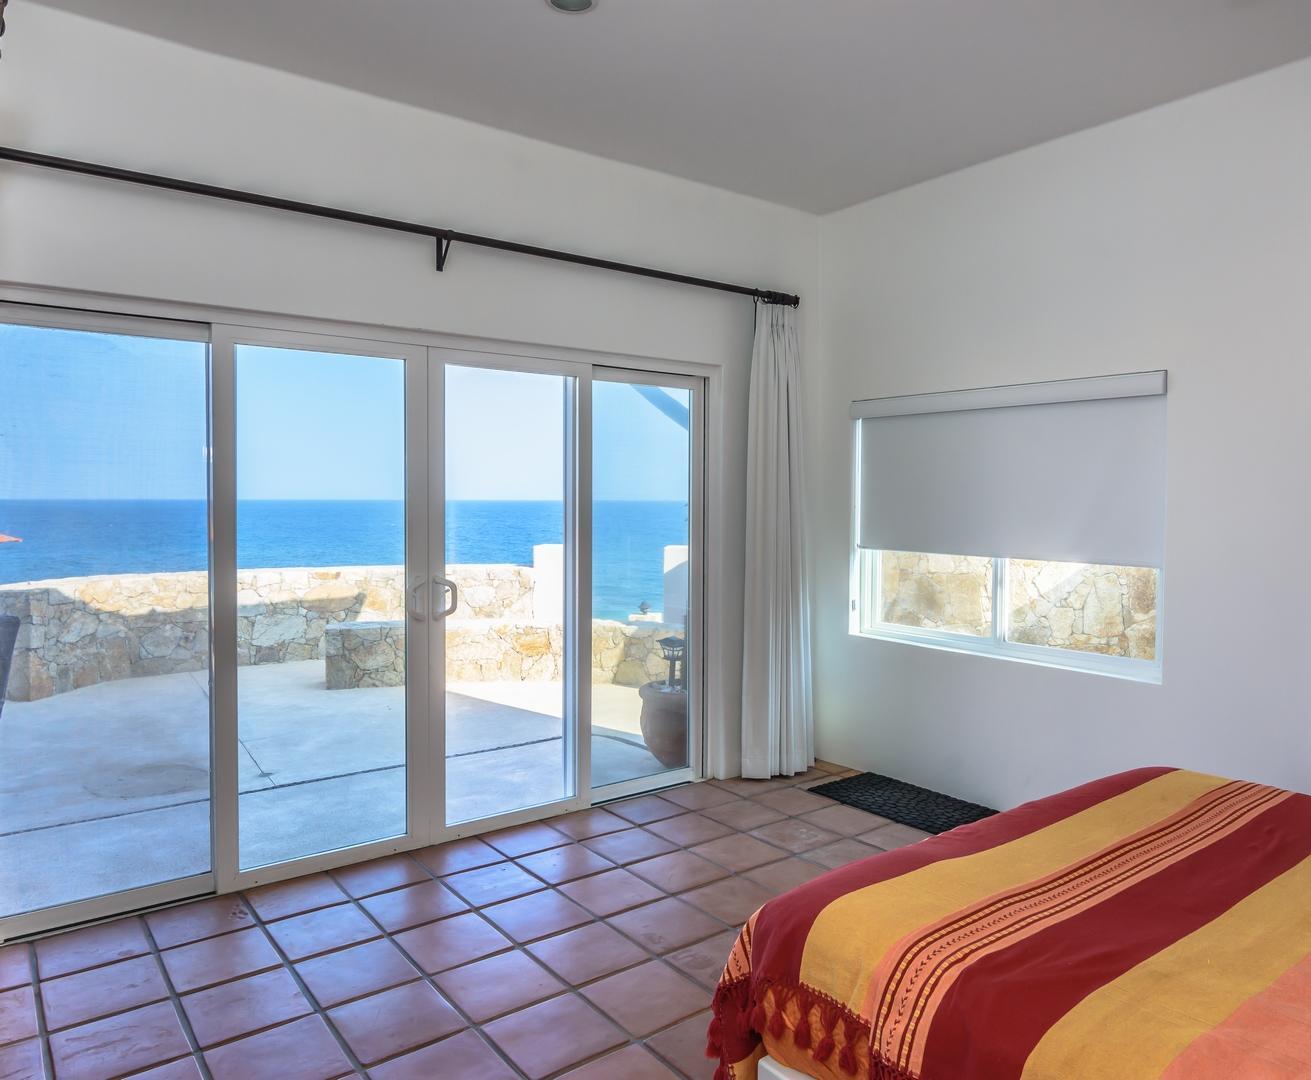 East Cape, 7 Bedrooms Bedrooms, ,7 BathroomsBathrooms,House,For Sale,Manzana 1, Camino Costero,19-1459